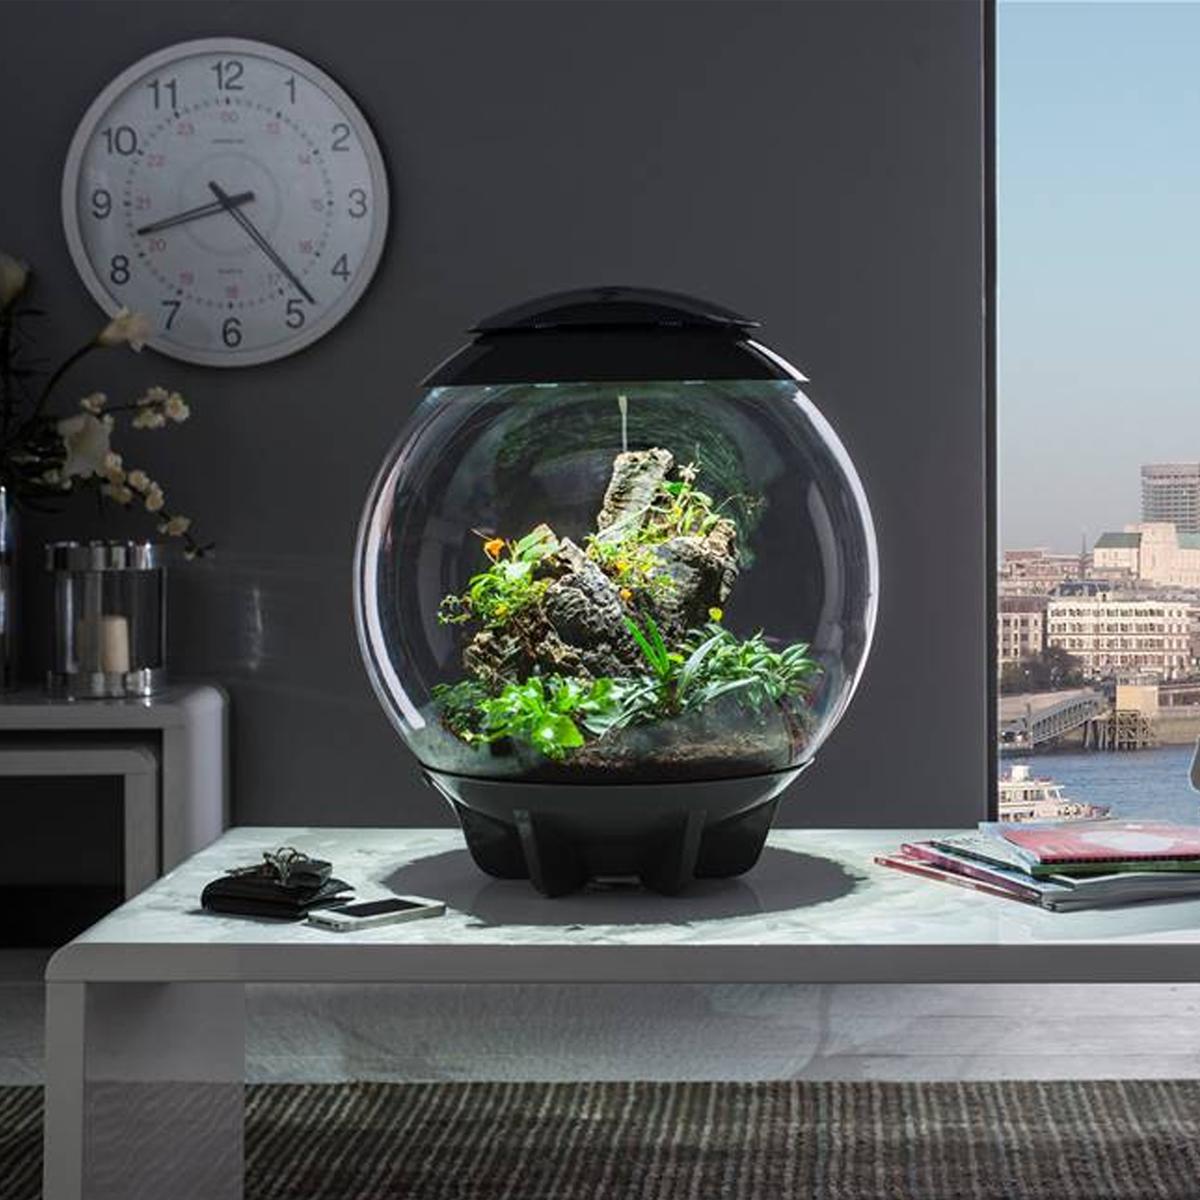 Awesome Sentinel Biorb Air L Terrarium Acrylic Tank Led